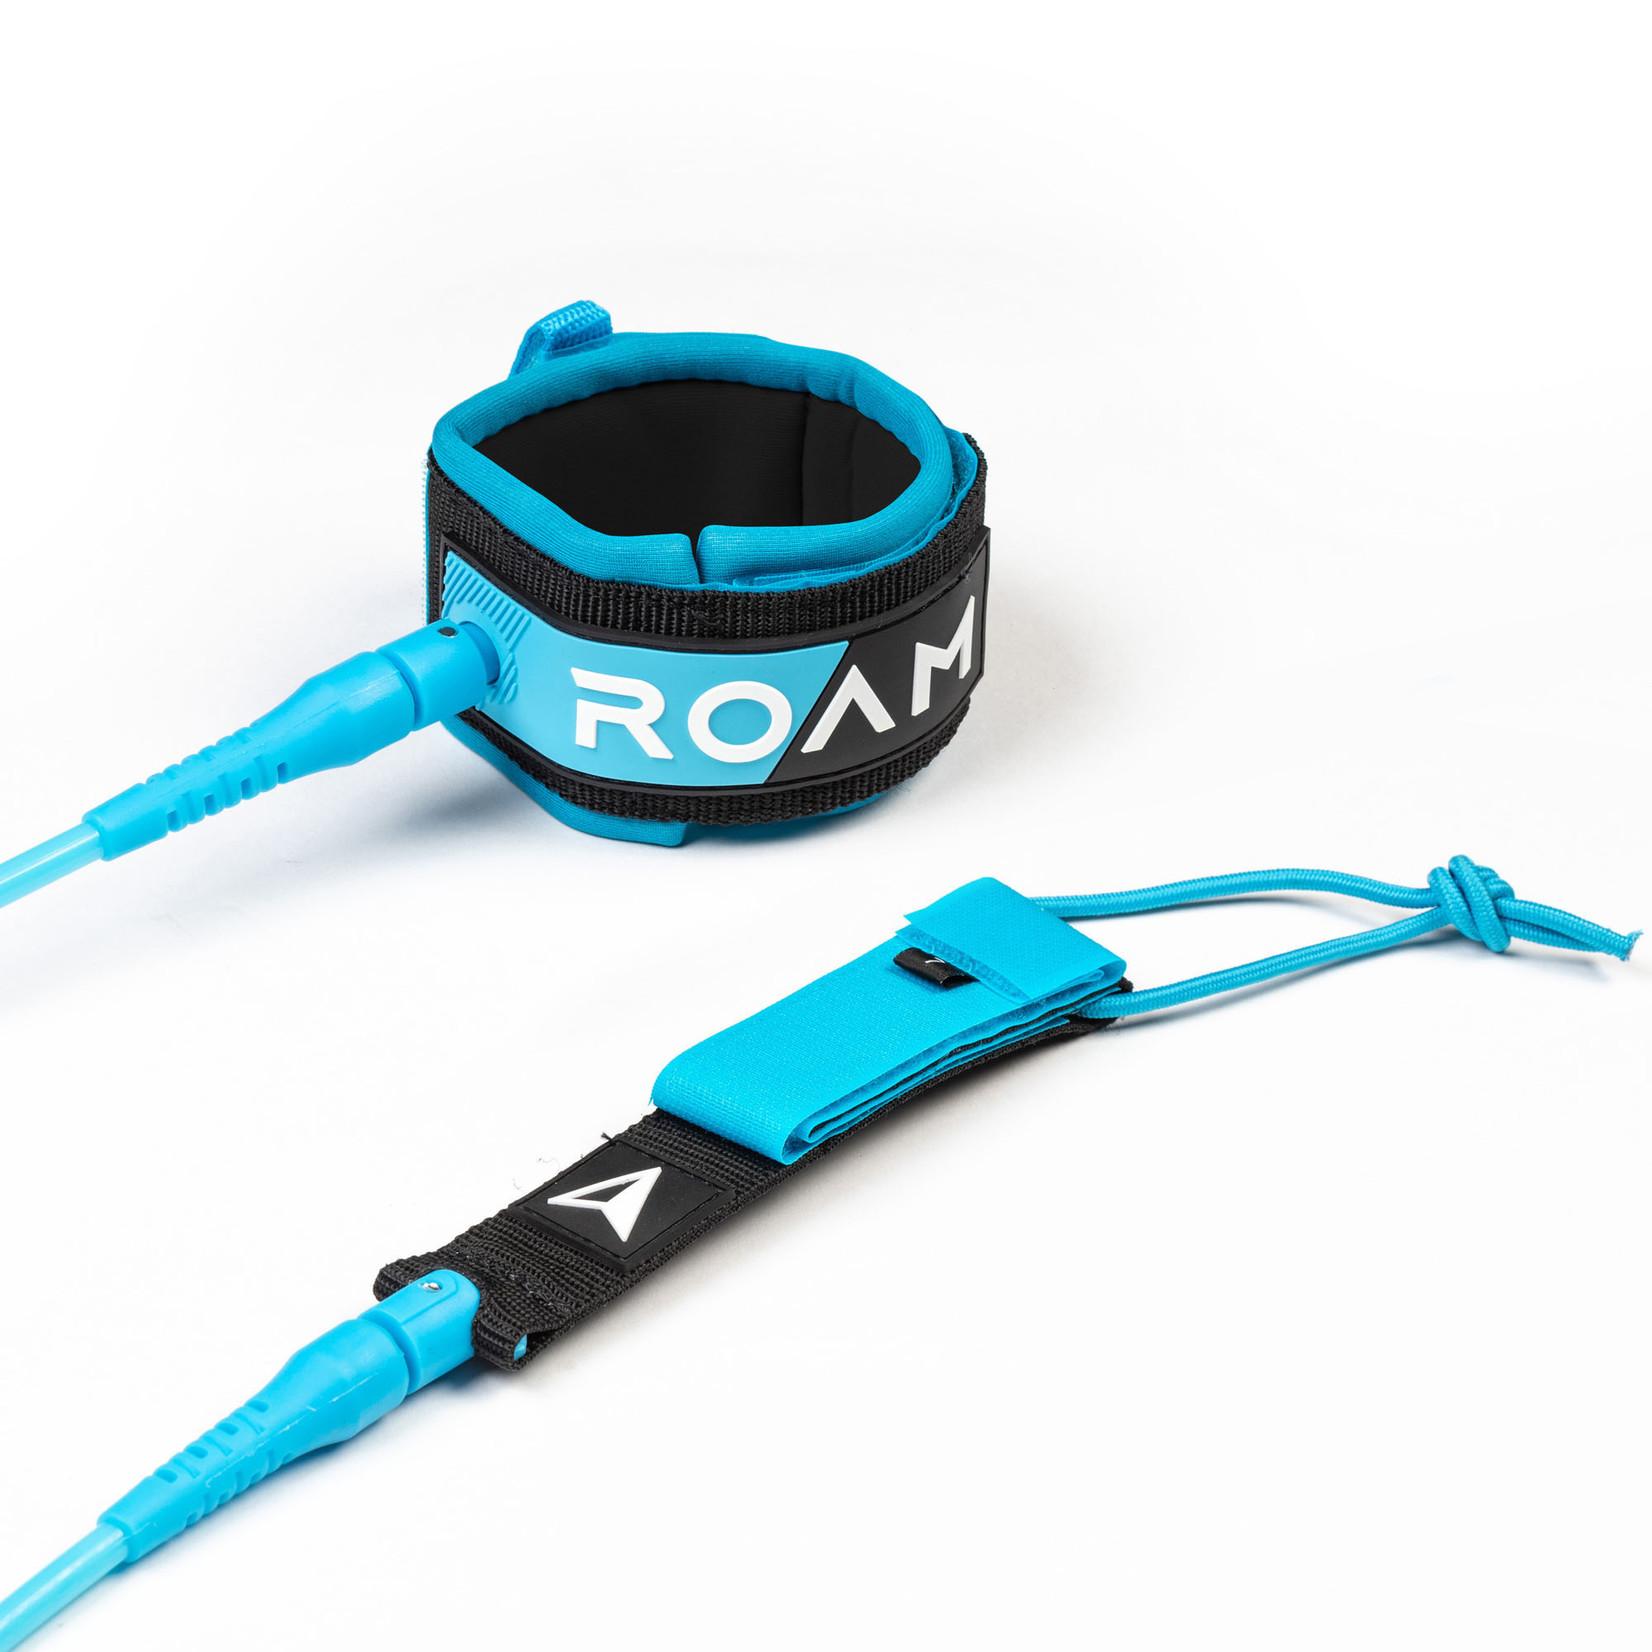 Roam ROAM Premium Double Swivel Surf Leash 9' Calf.